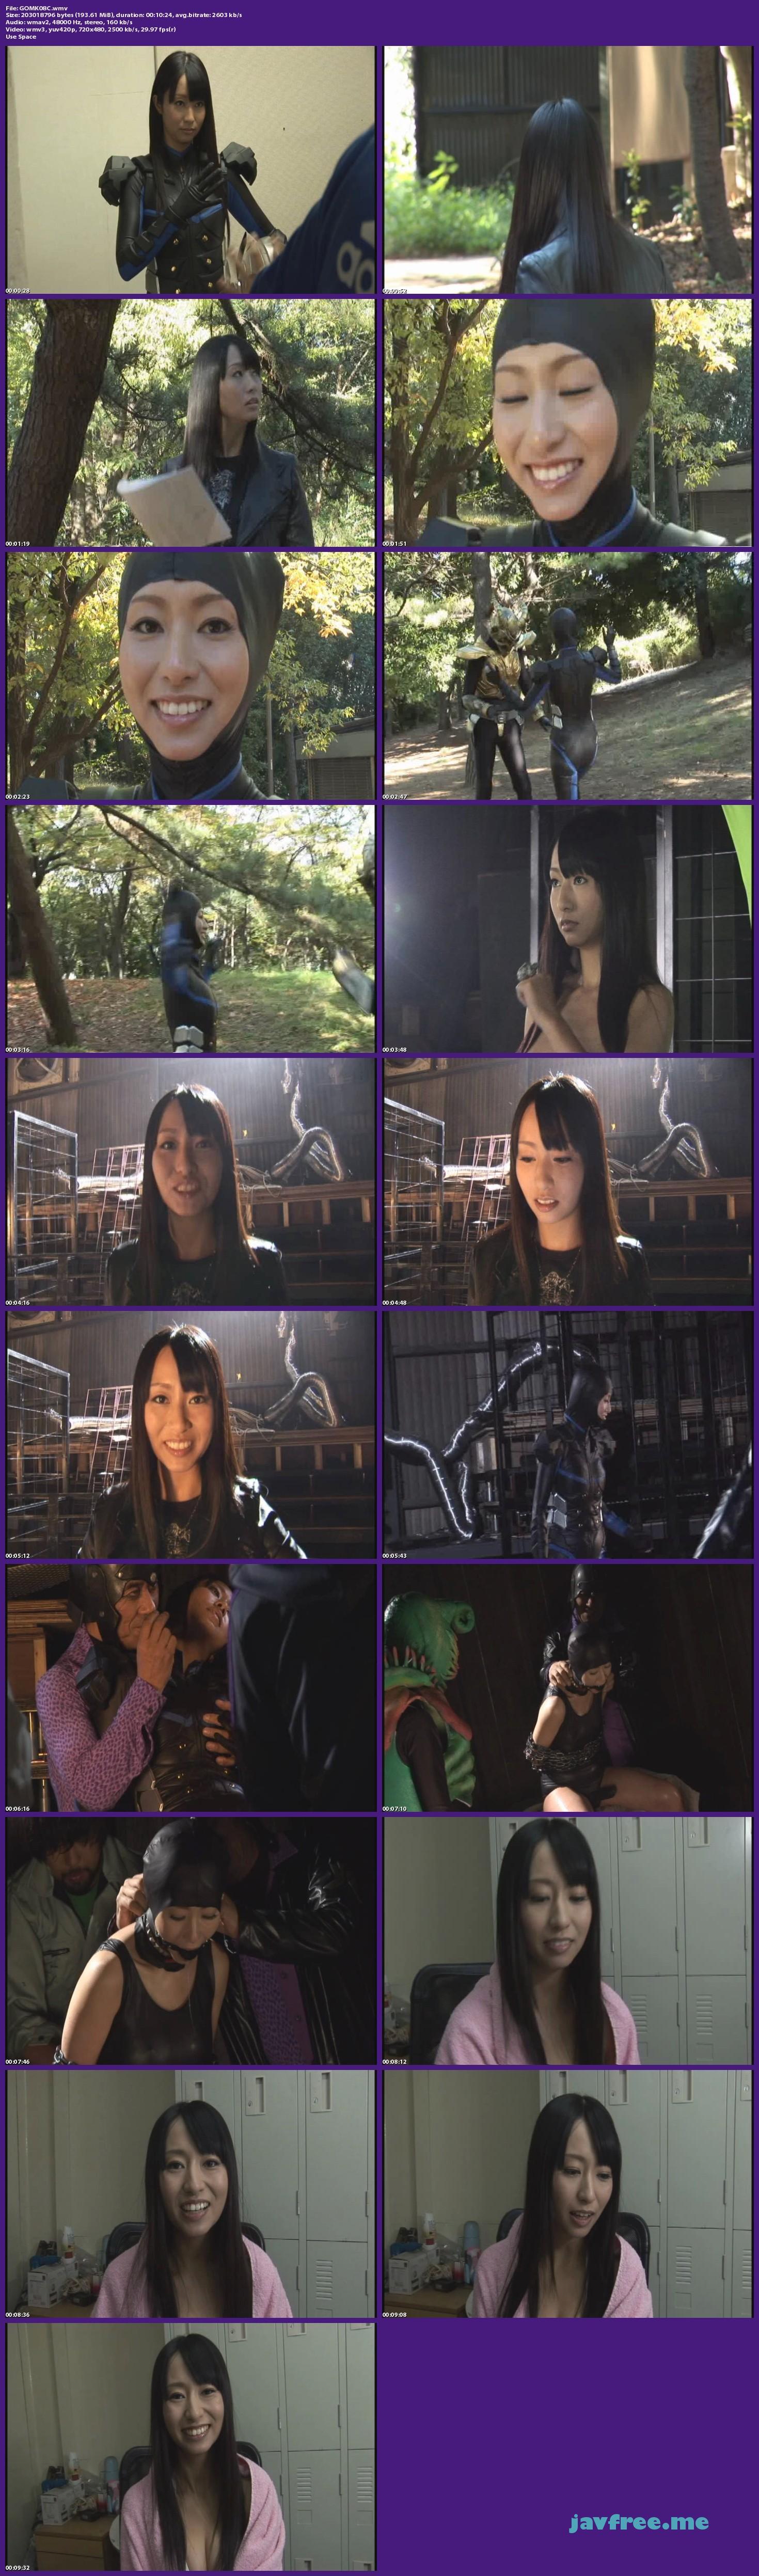 [GOMK 08] クールビューティーヒロイン ストライダー 東尾真子 東尾真子 GIGA